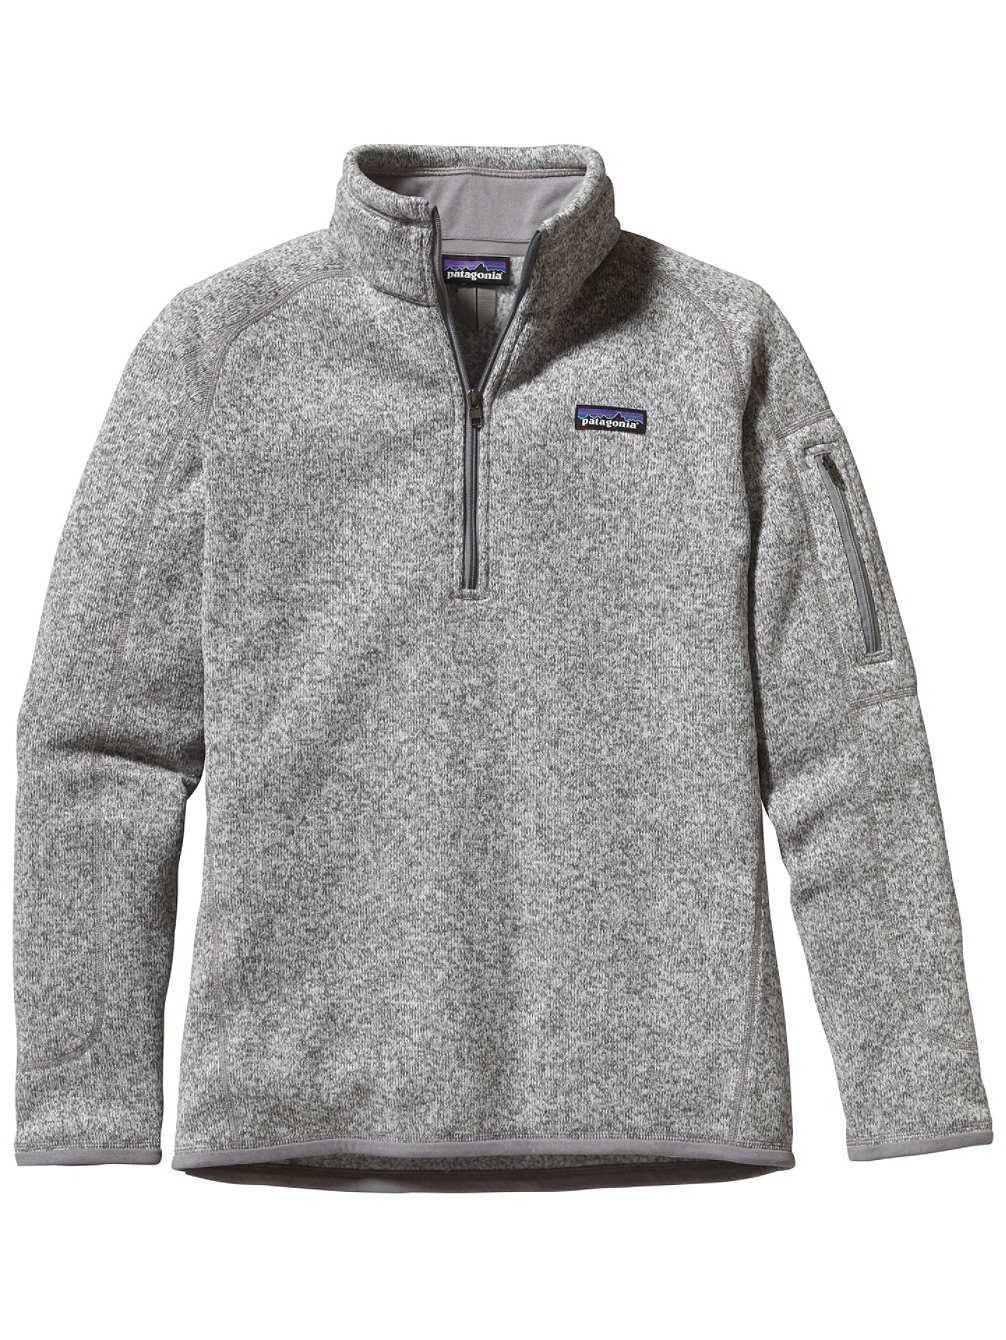 Patagonia  Women's  Sweater with 1/4 Zip Fleece - Medium - Birch White by Patagonia (Image #1)